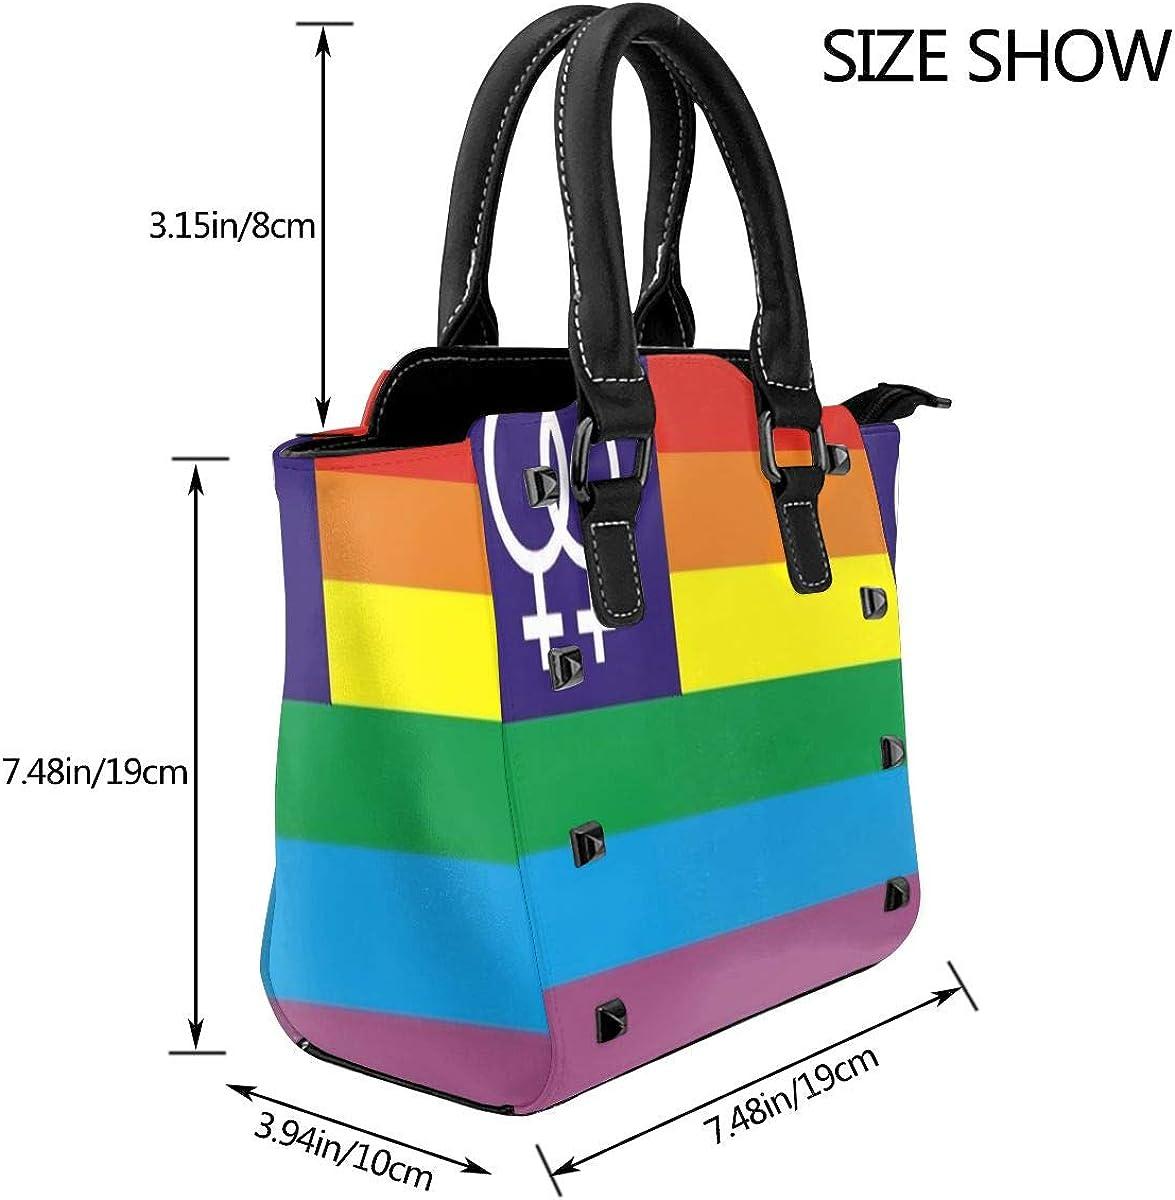 Tote Bag Rainbow Venus Flag Shoulder Bag 3D Printed Non-fading Handbags Womens Waterproof Handle Bag Durable Multi-functional Crossbody Travel Bag With Strap Zipper